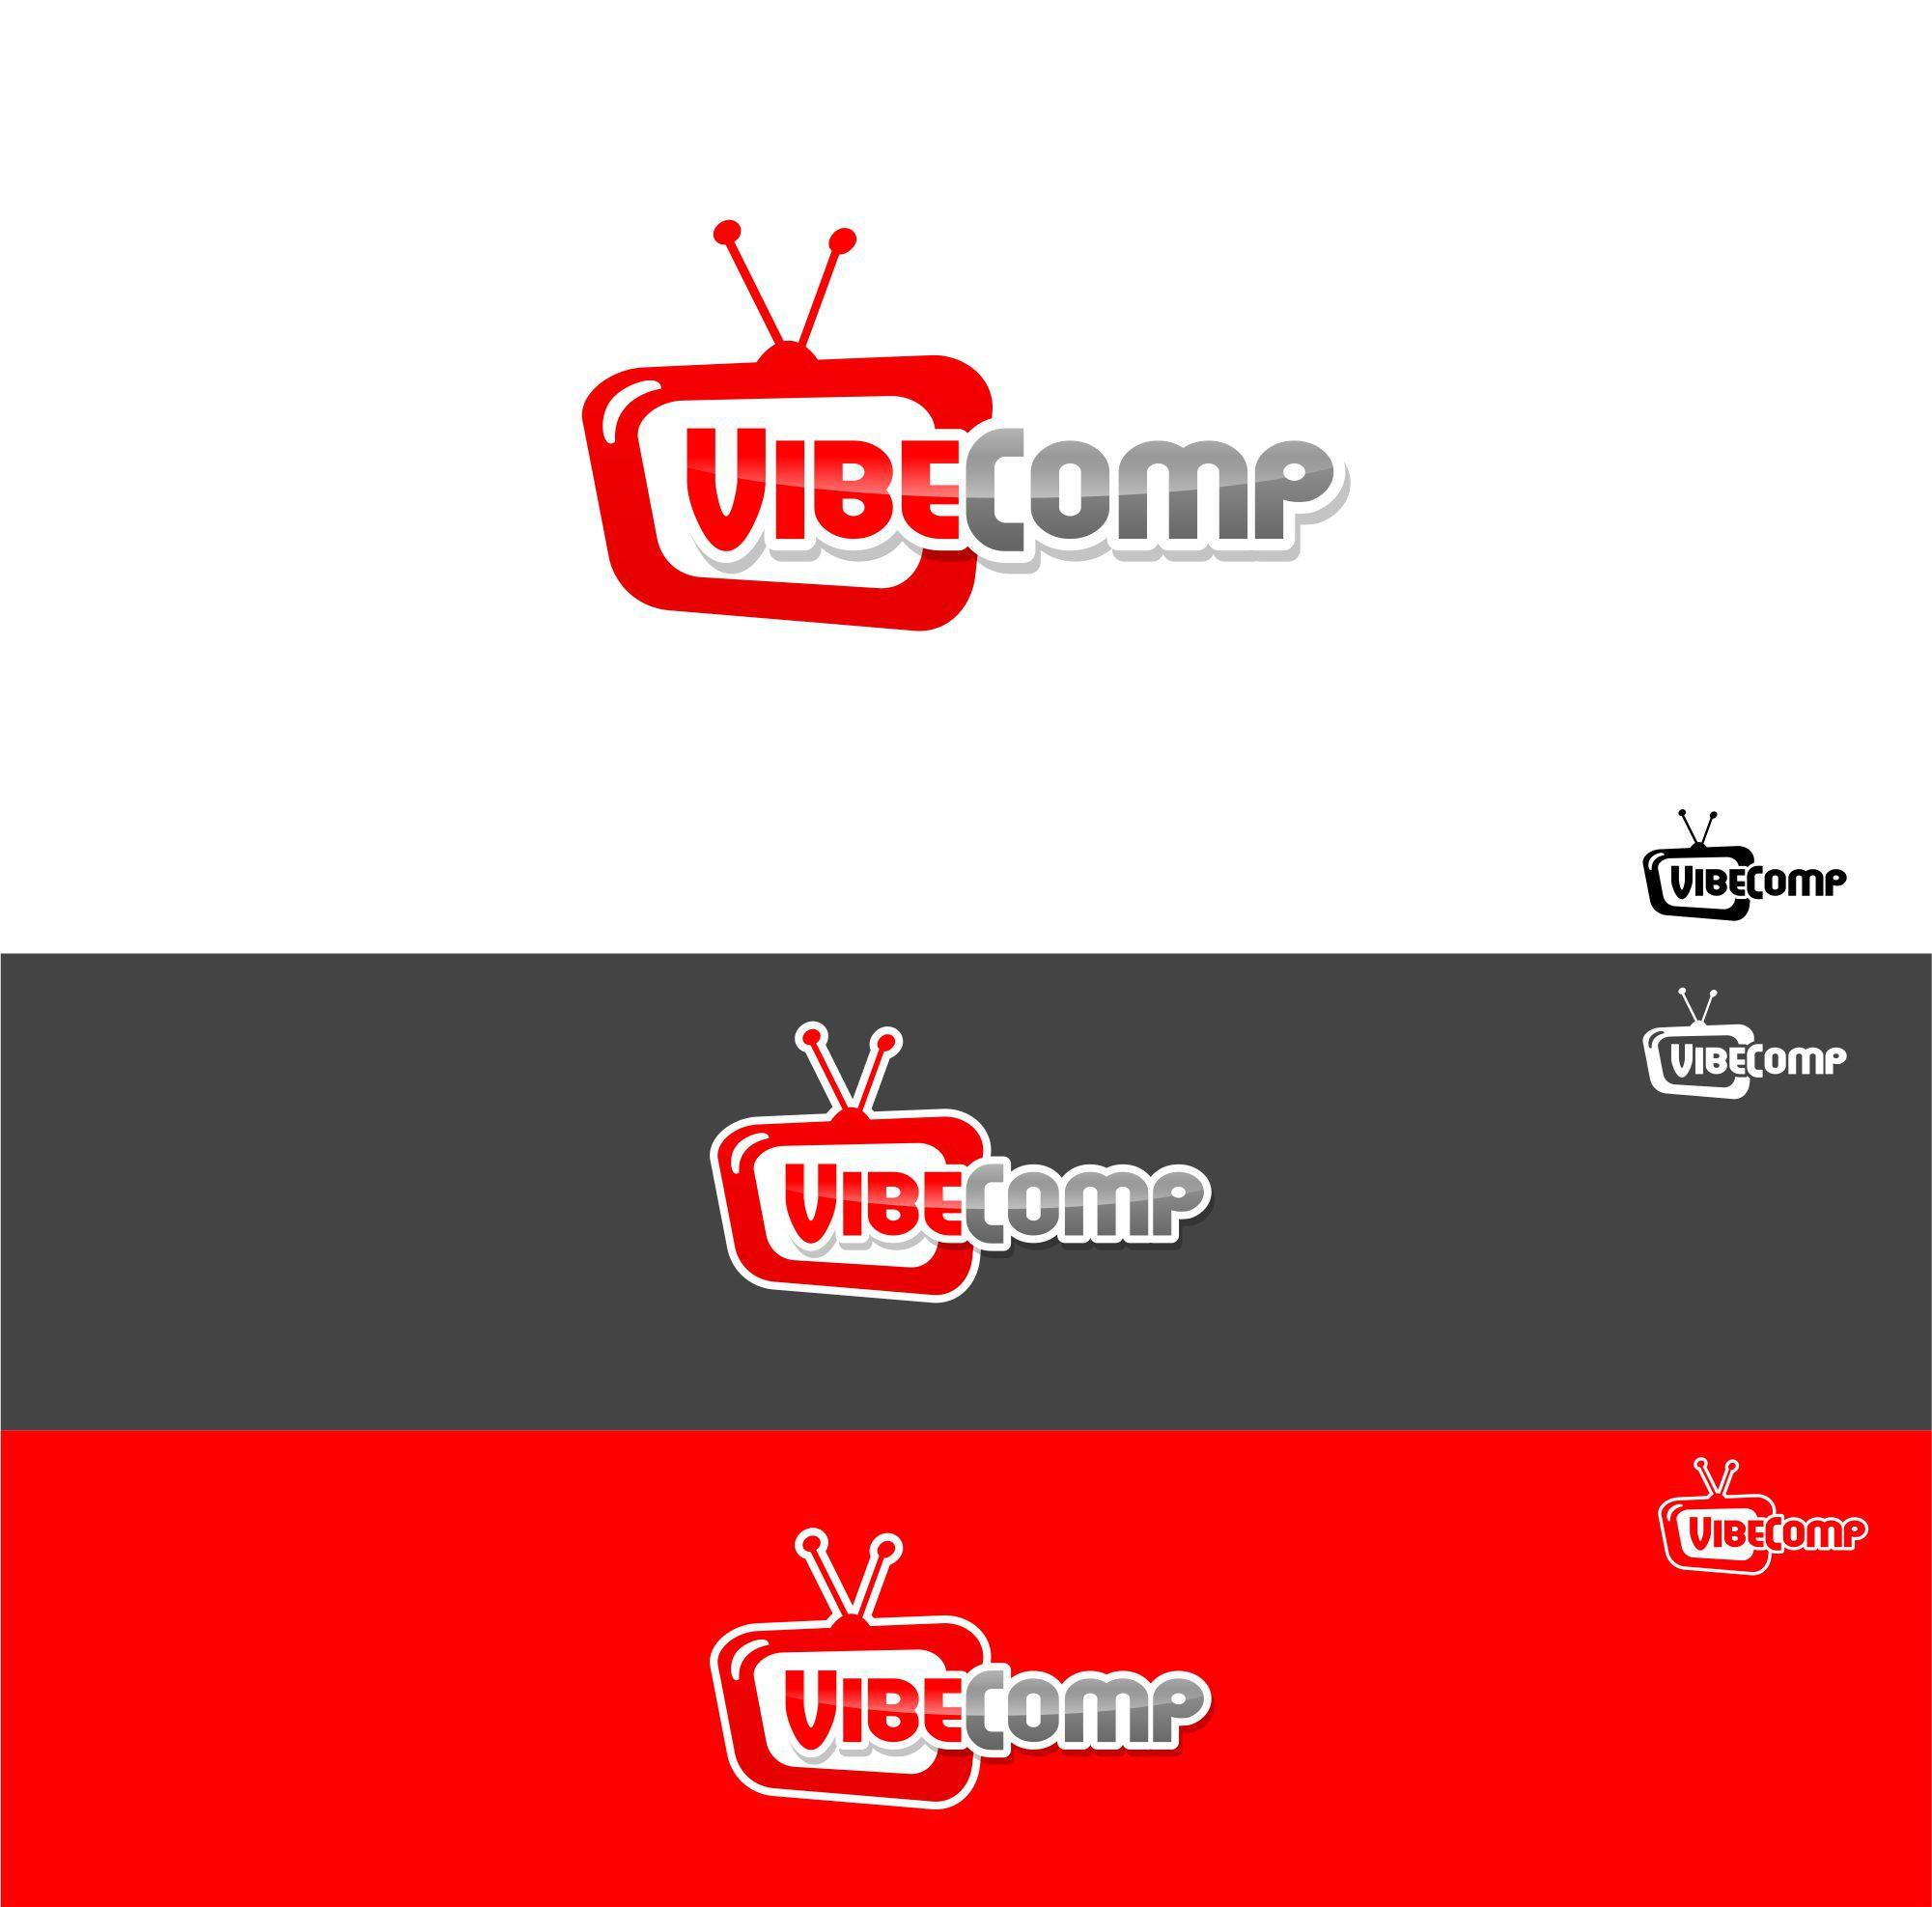 Video site logo contest